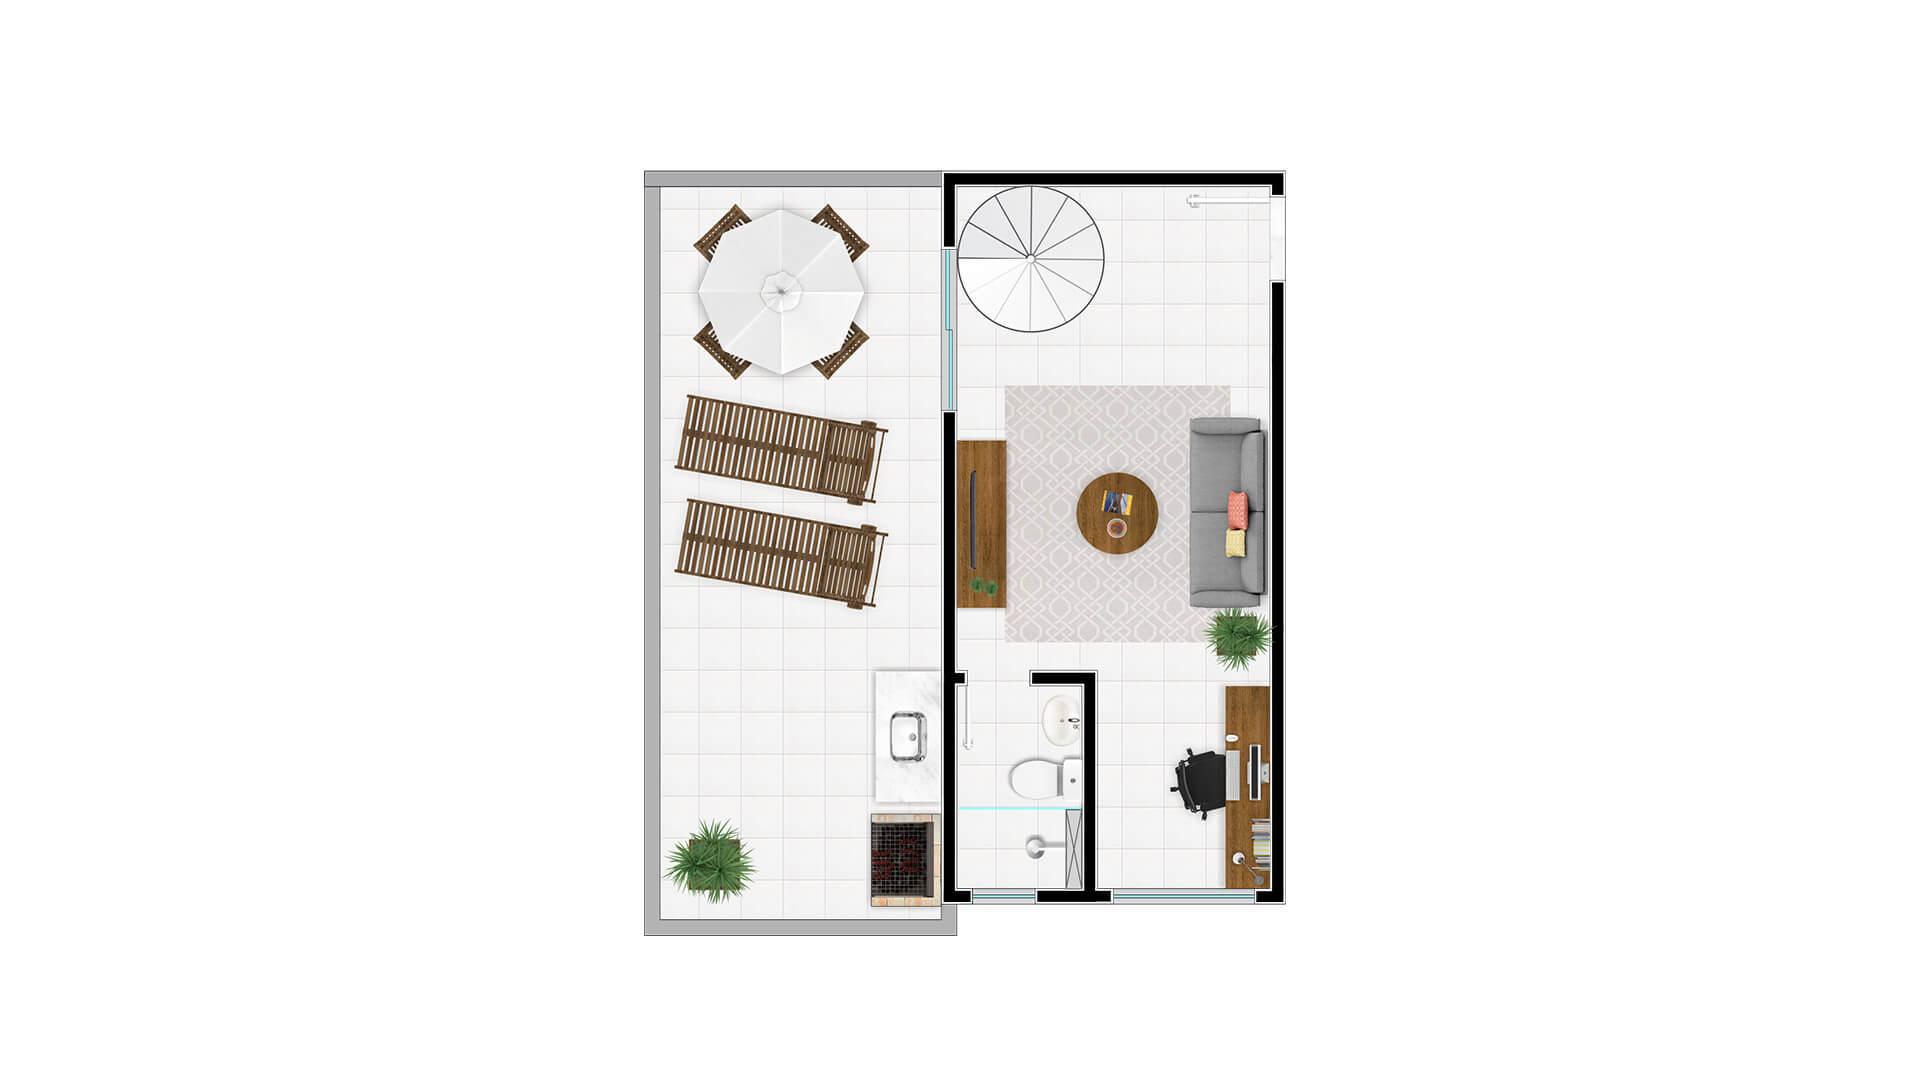 Cobertura Tipo 1 - 2º andar - Millennium Residence